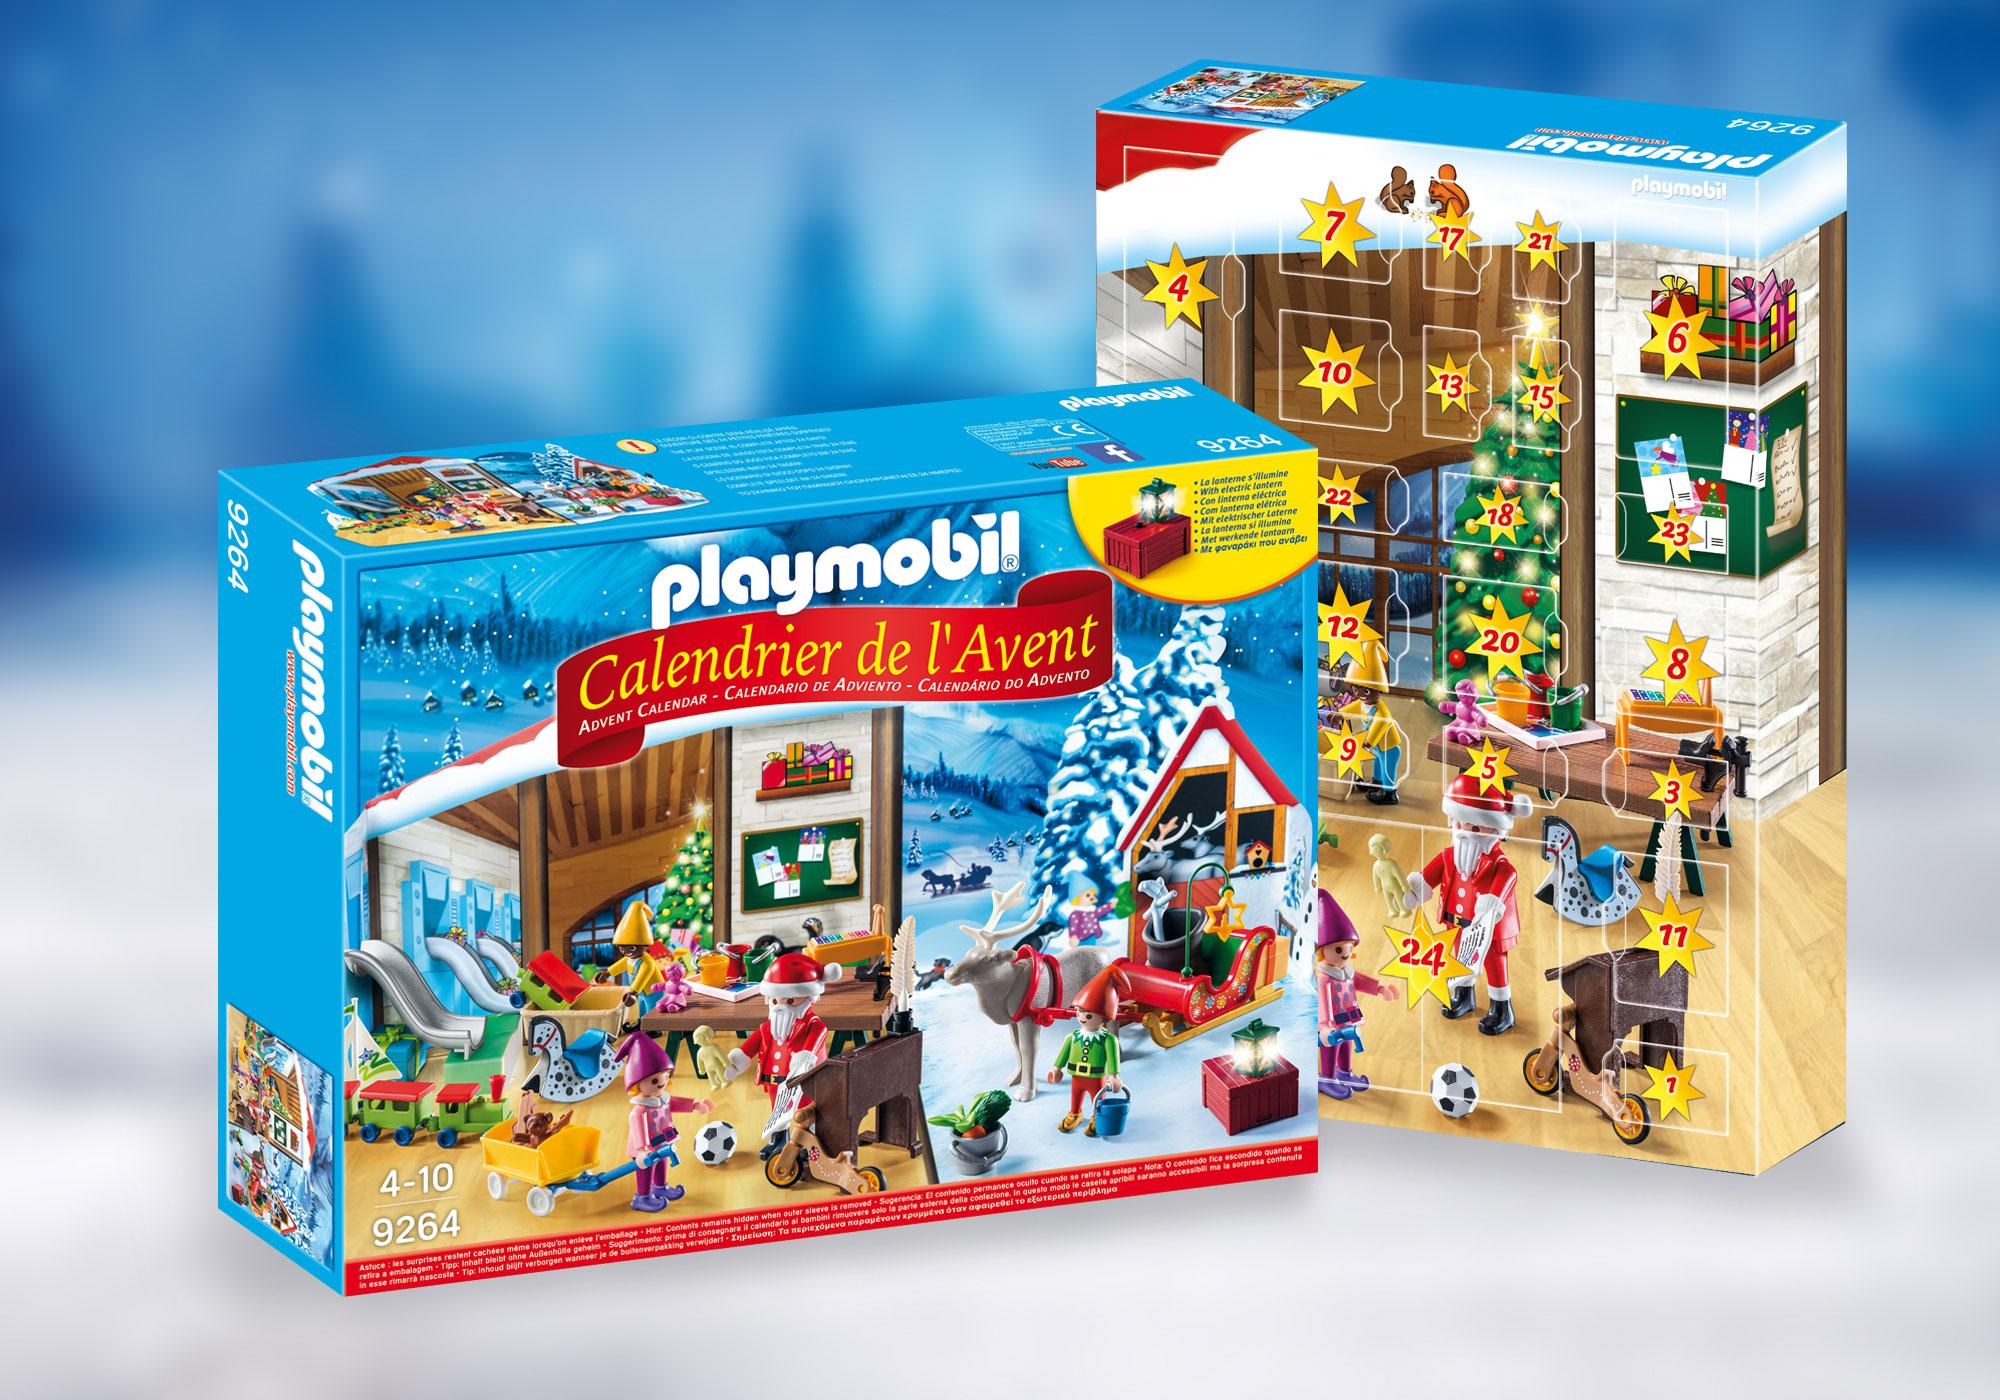 "http://media.playmobil.com/i/playmobil/9264_product_detail/Calendrier de l'Avent ""Fabrique du Père Noël"""